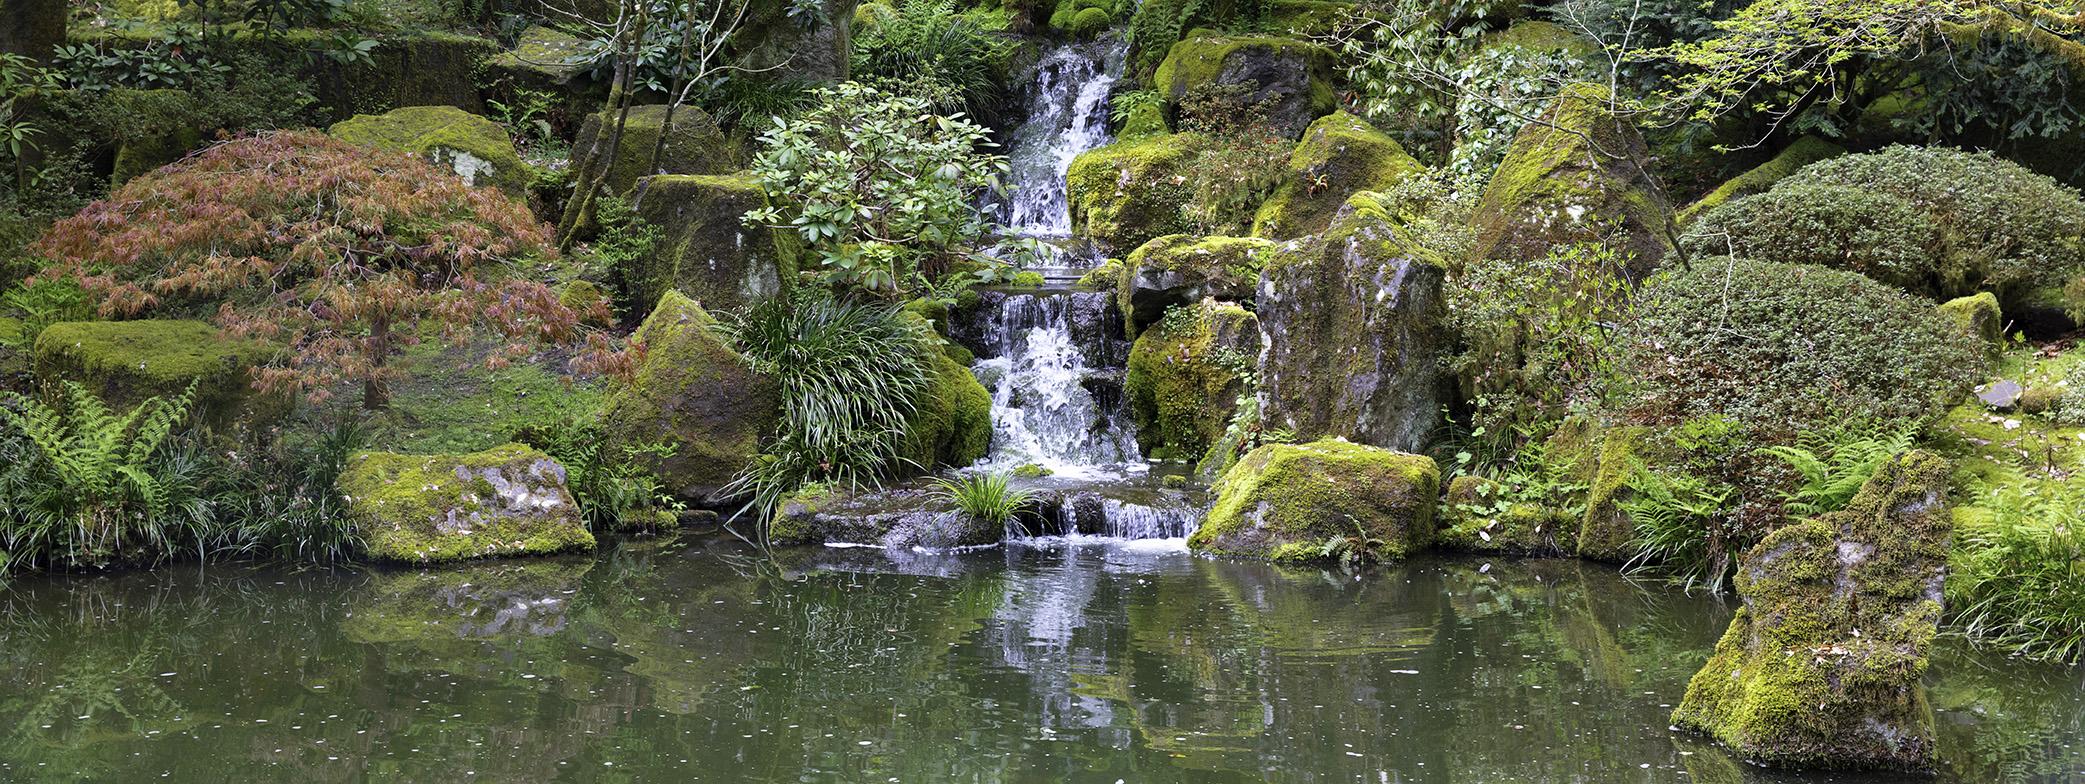 Scenic waterfall in Japanese garden